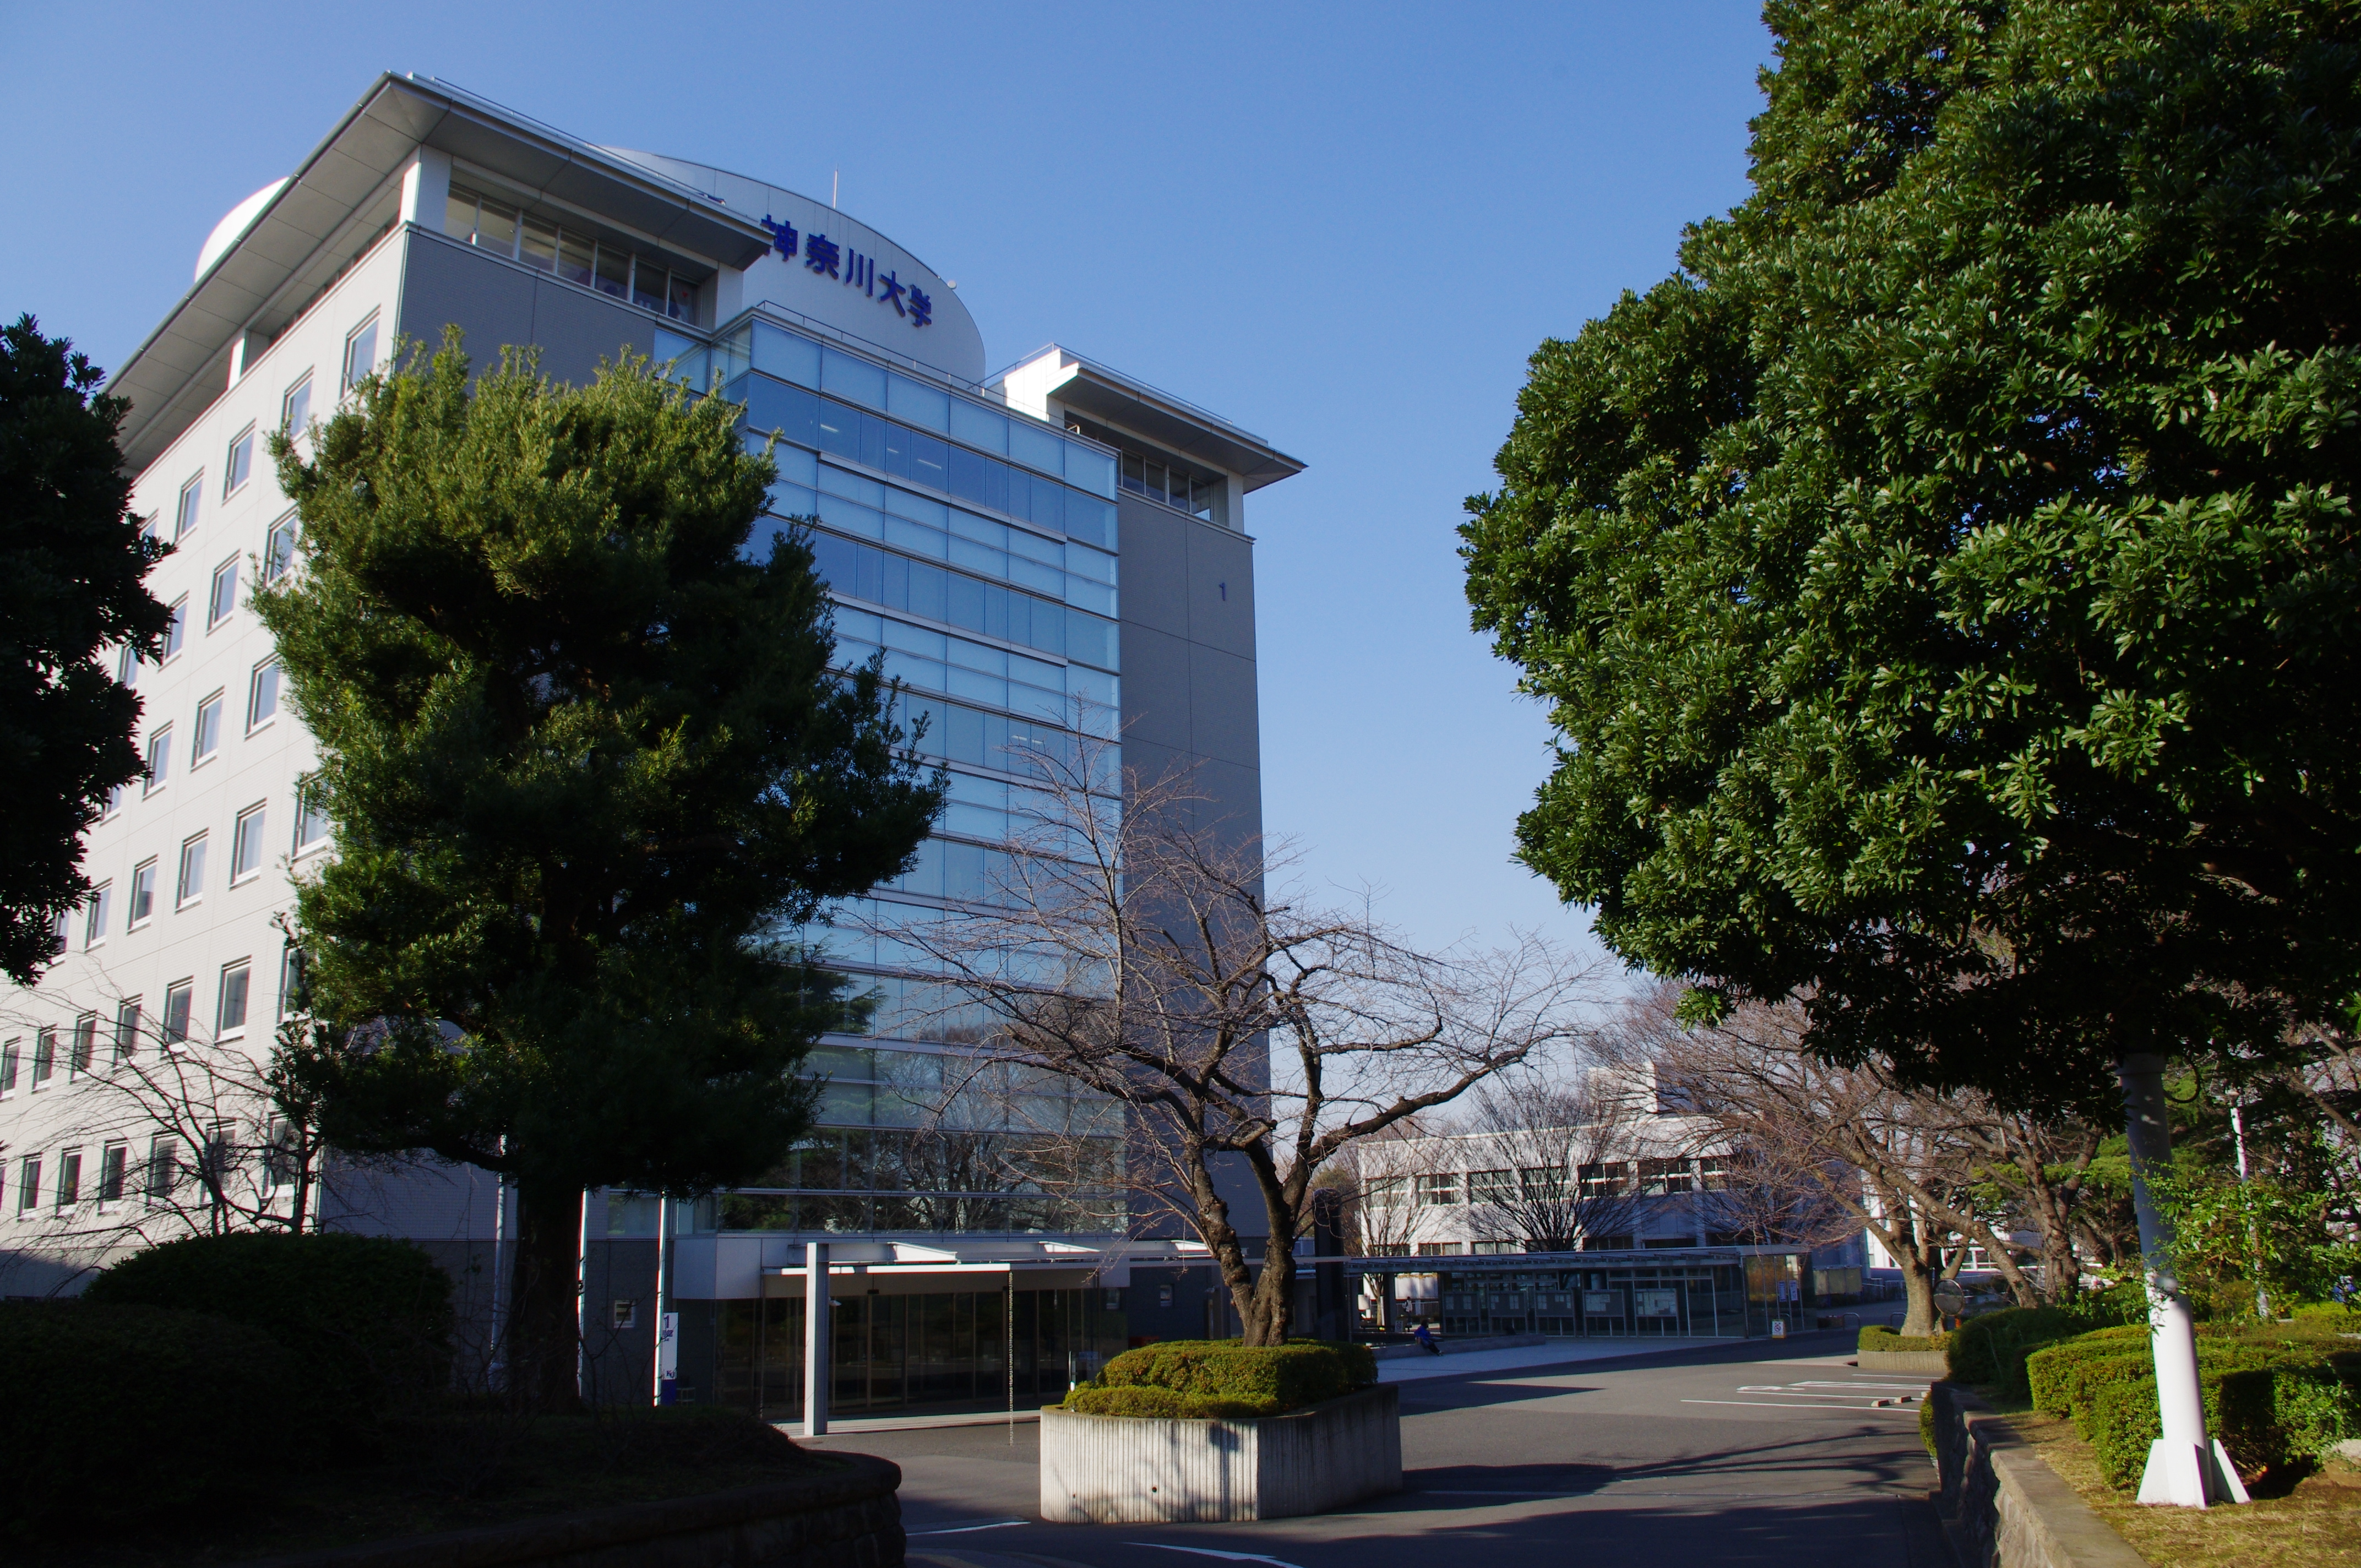 神奈川大学 - Wikipedia